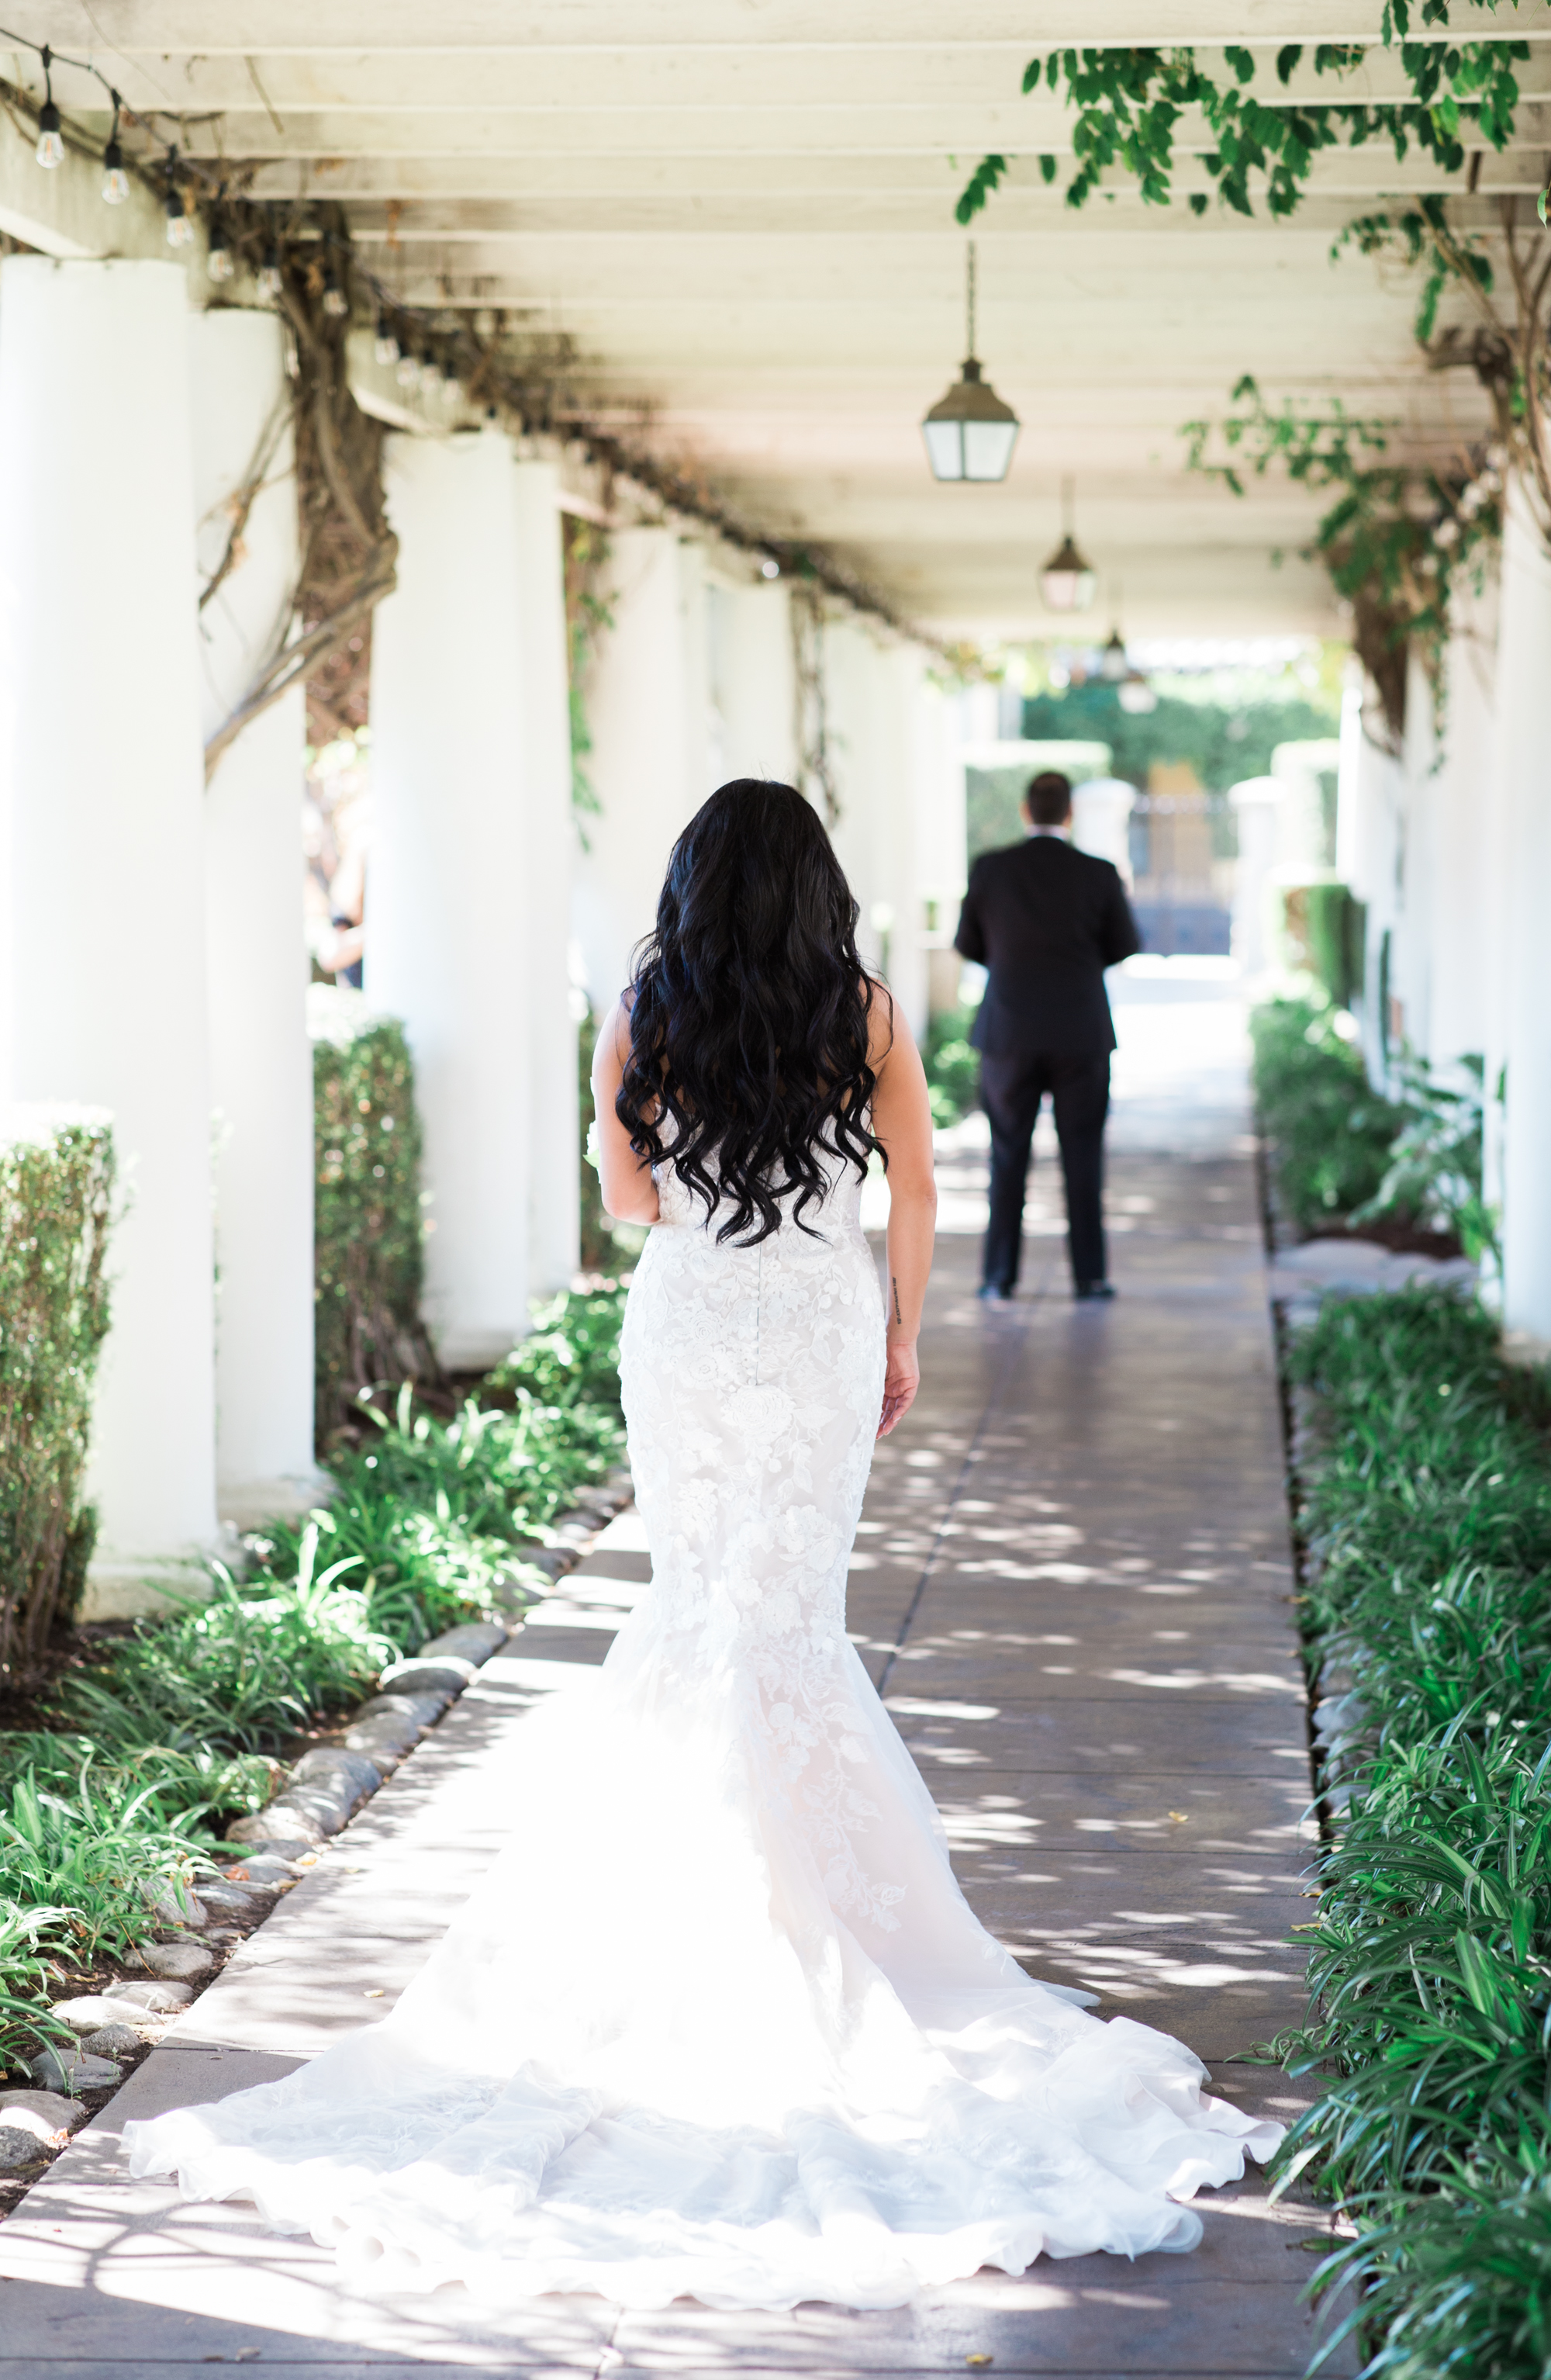 Bonphotage California Fine Art Wedding Photography - Langham Huntington Pasadena